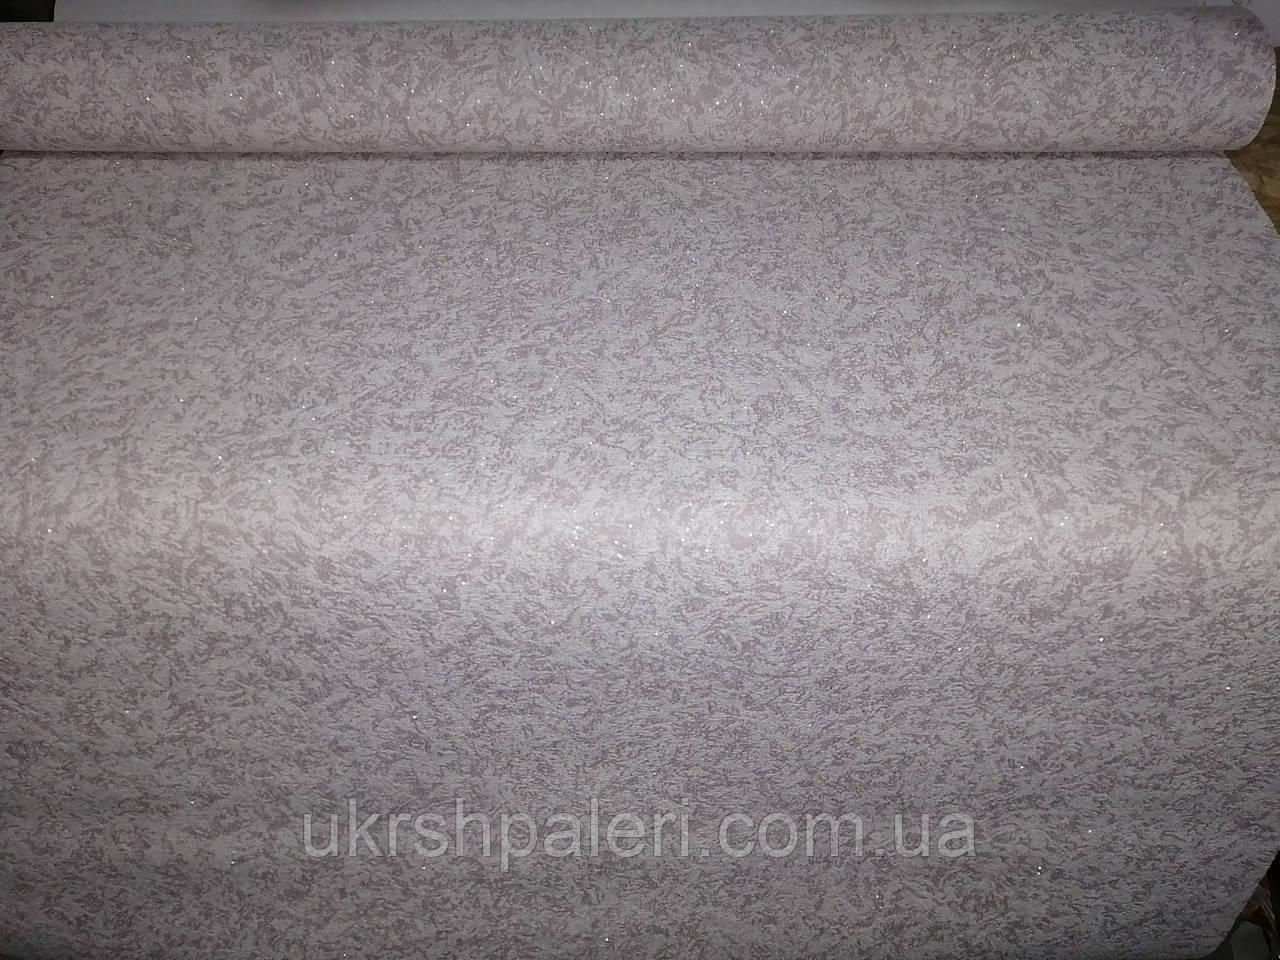 Обои Аида 3 501-01  виниловые на флизелиновой основе ширина 1.06,в рулоне 5 полос по 3 метра.